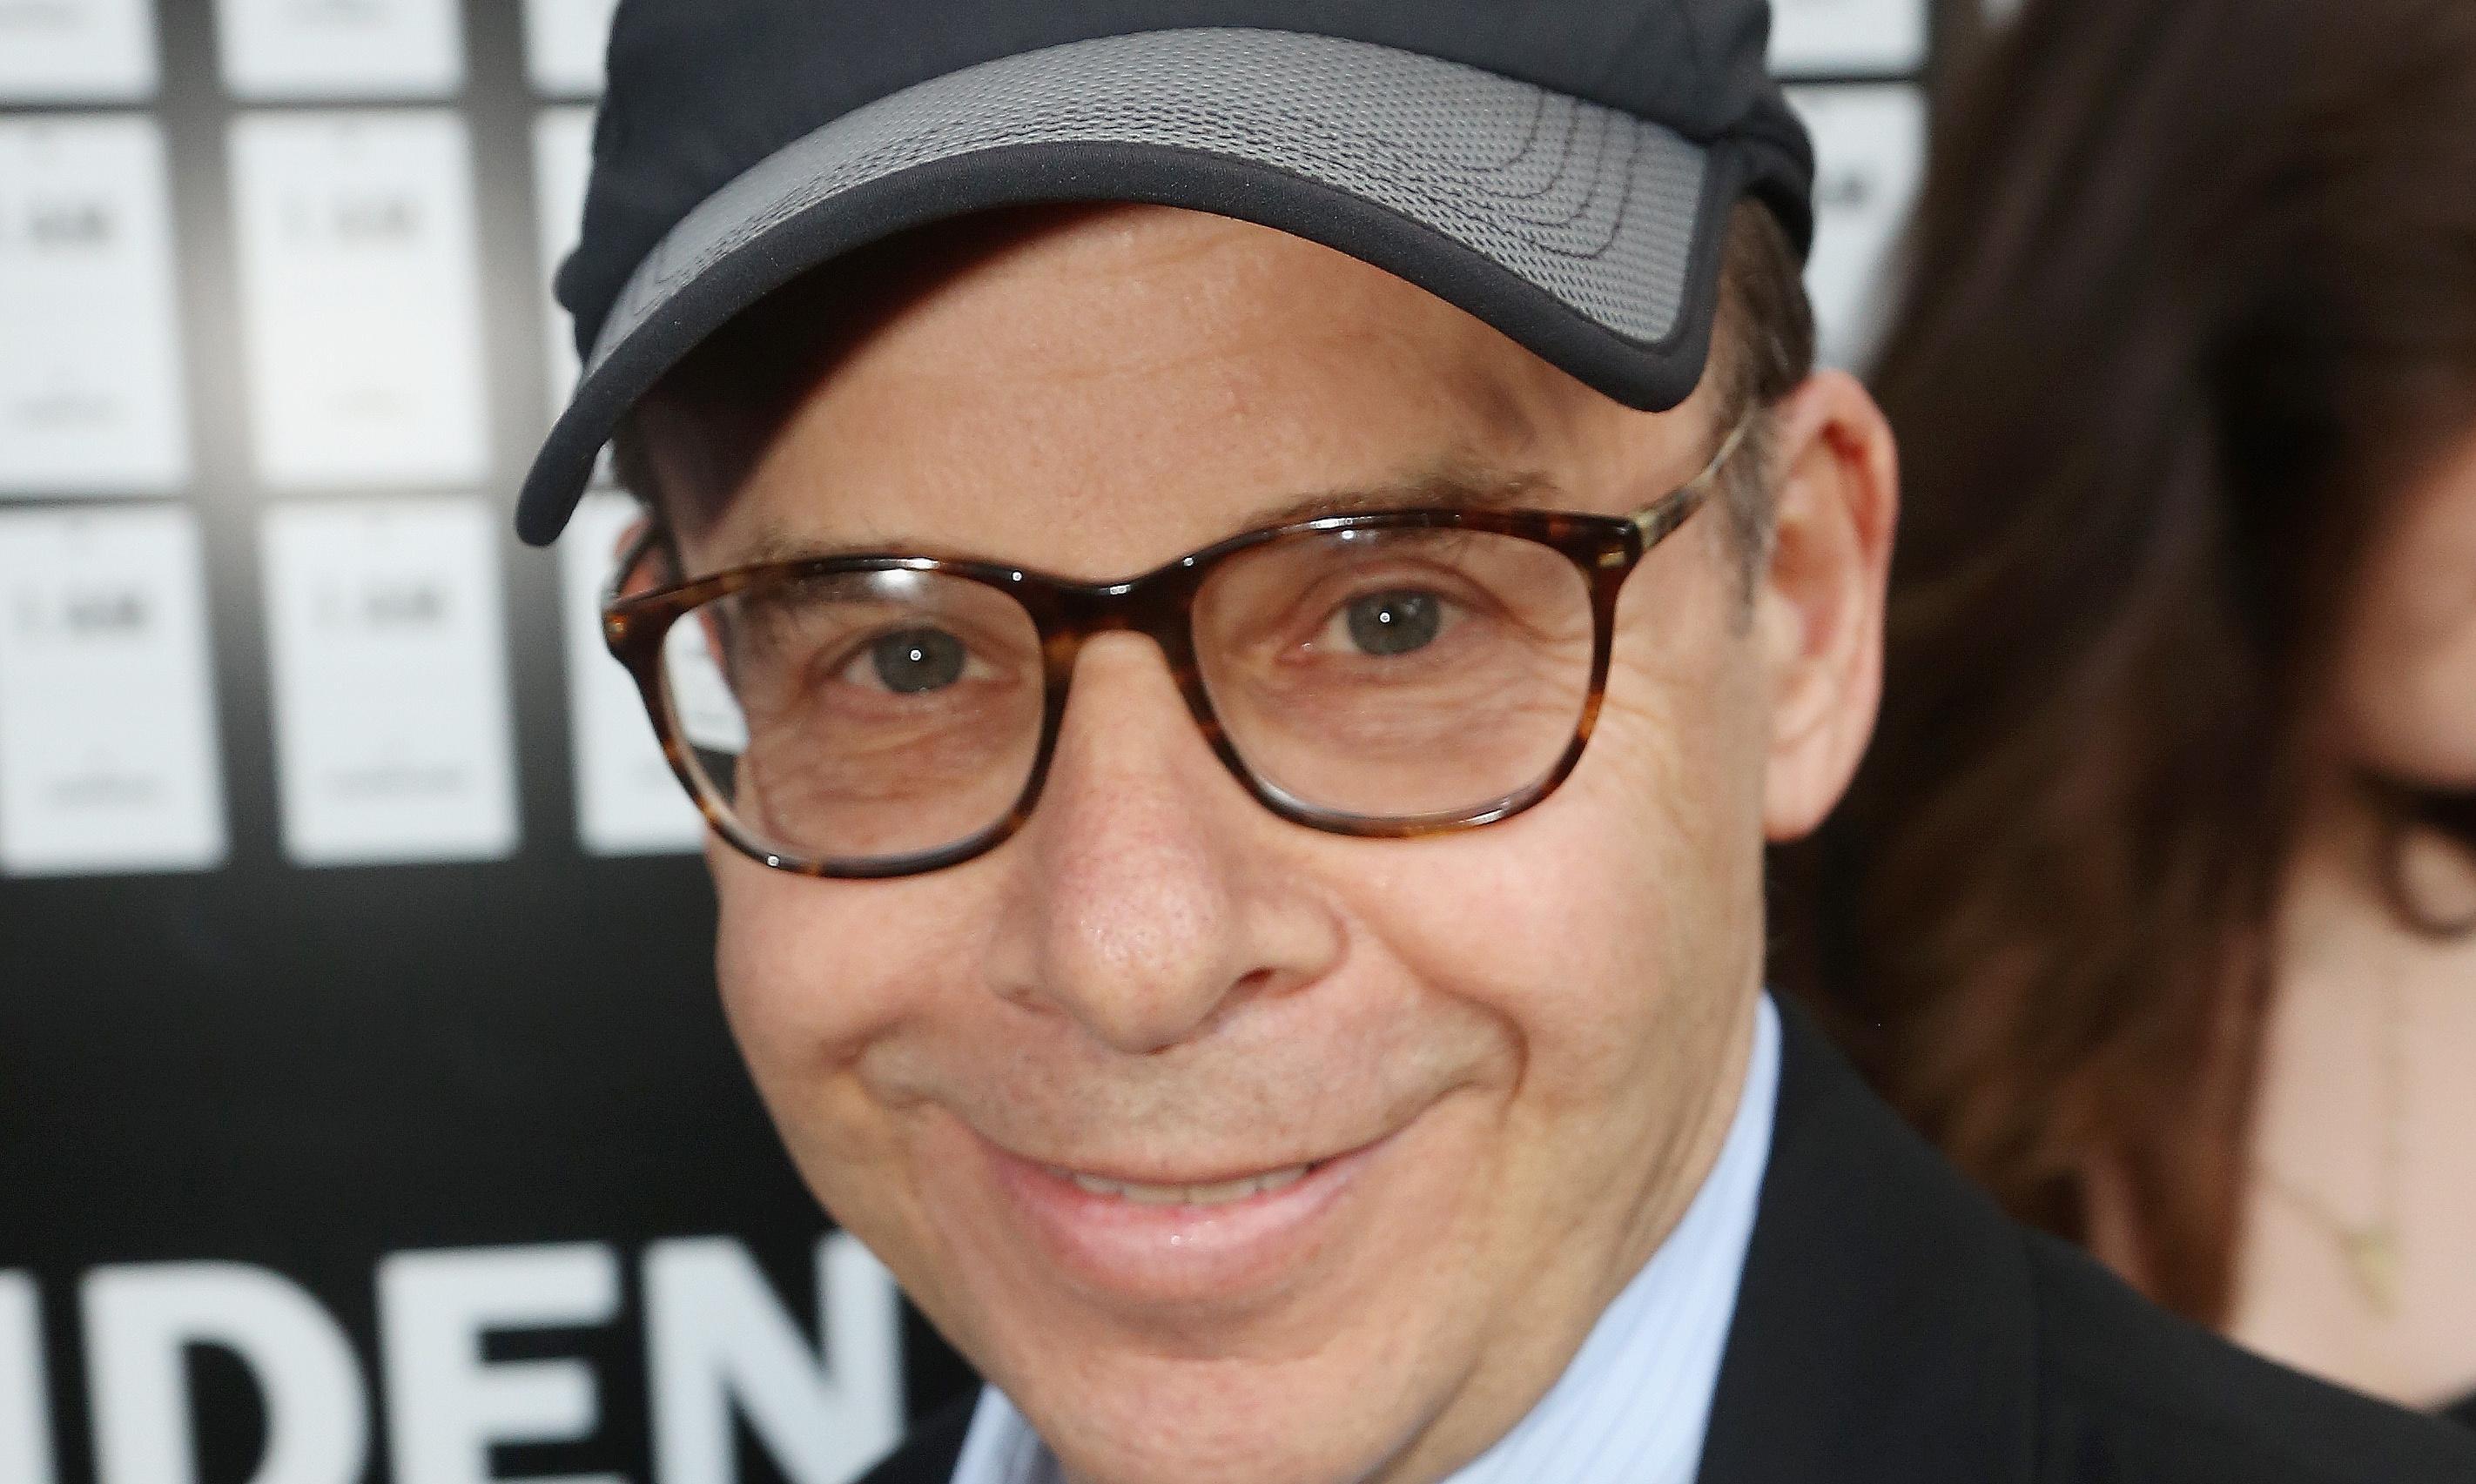 Rick Moranis to make Honey I Shrunk the Kids reboot after 23-year break